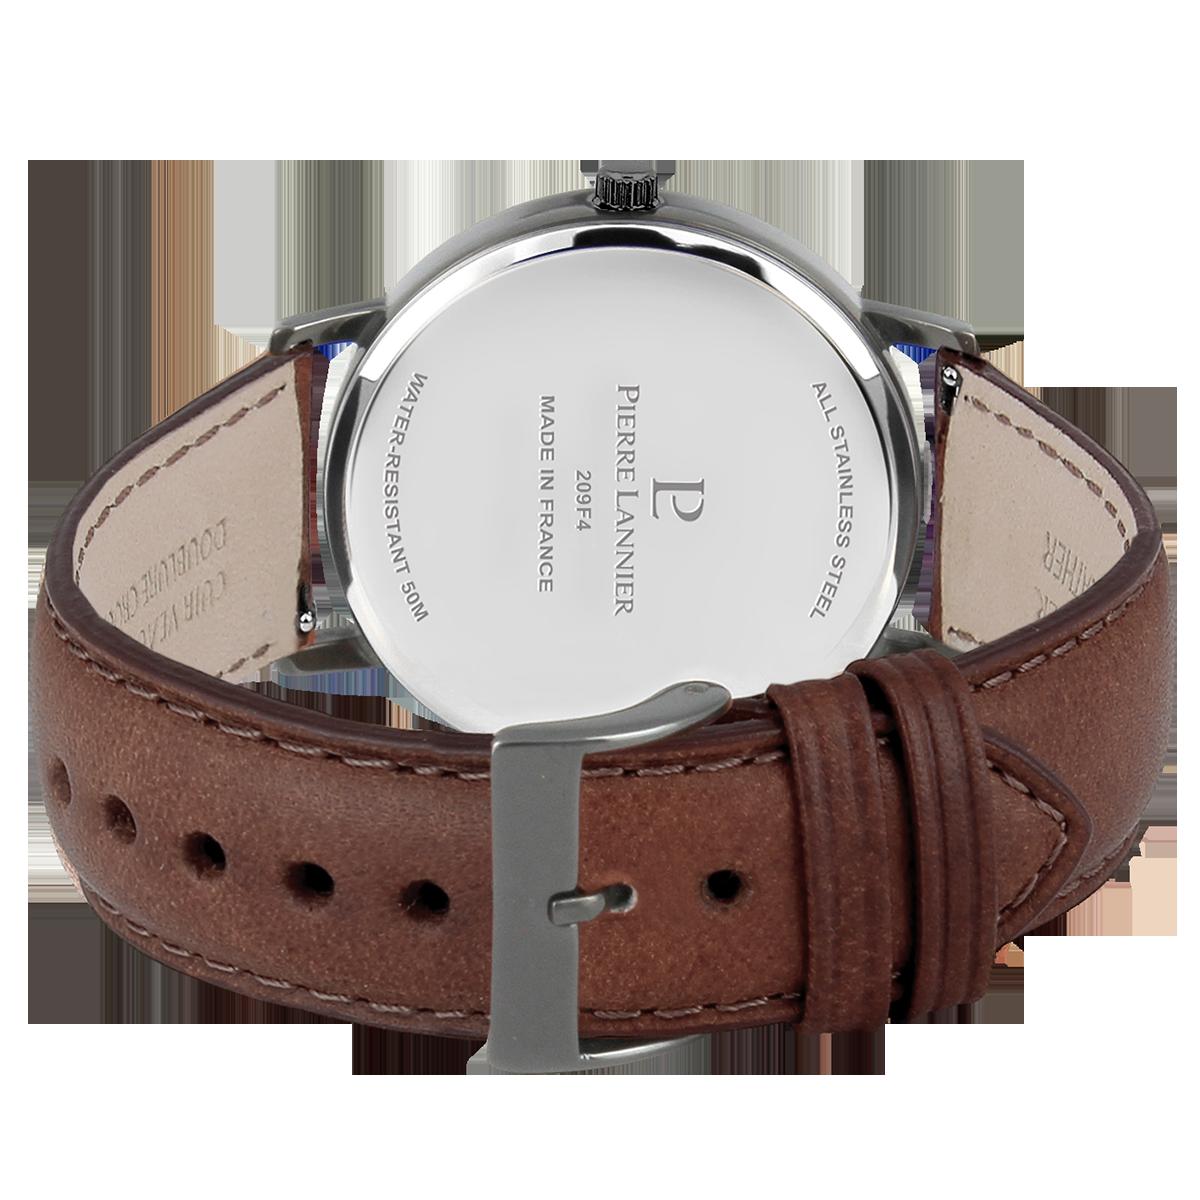 Мужские часы Pierre Lannier Cityline 209F434